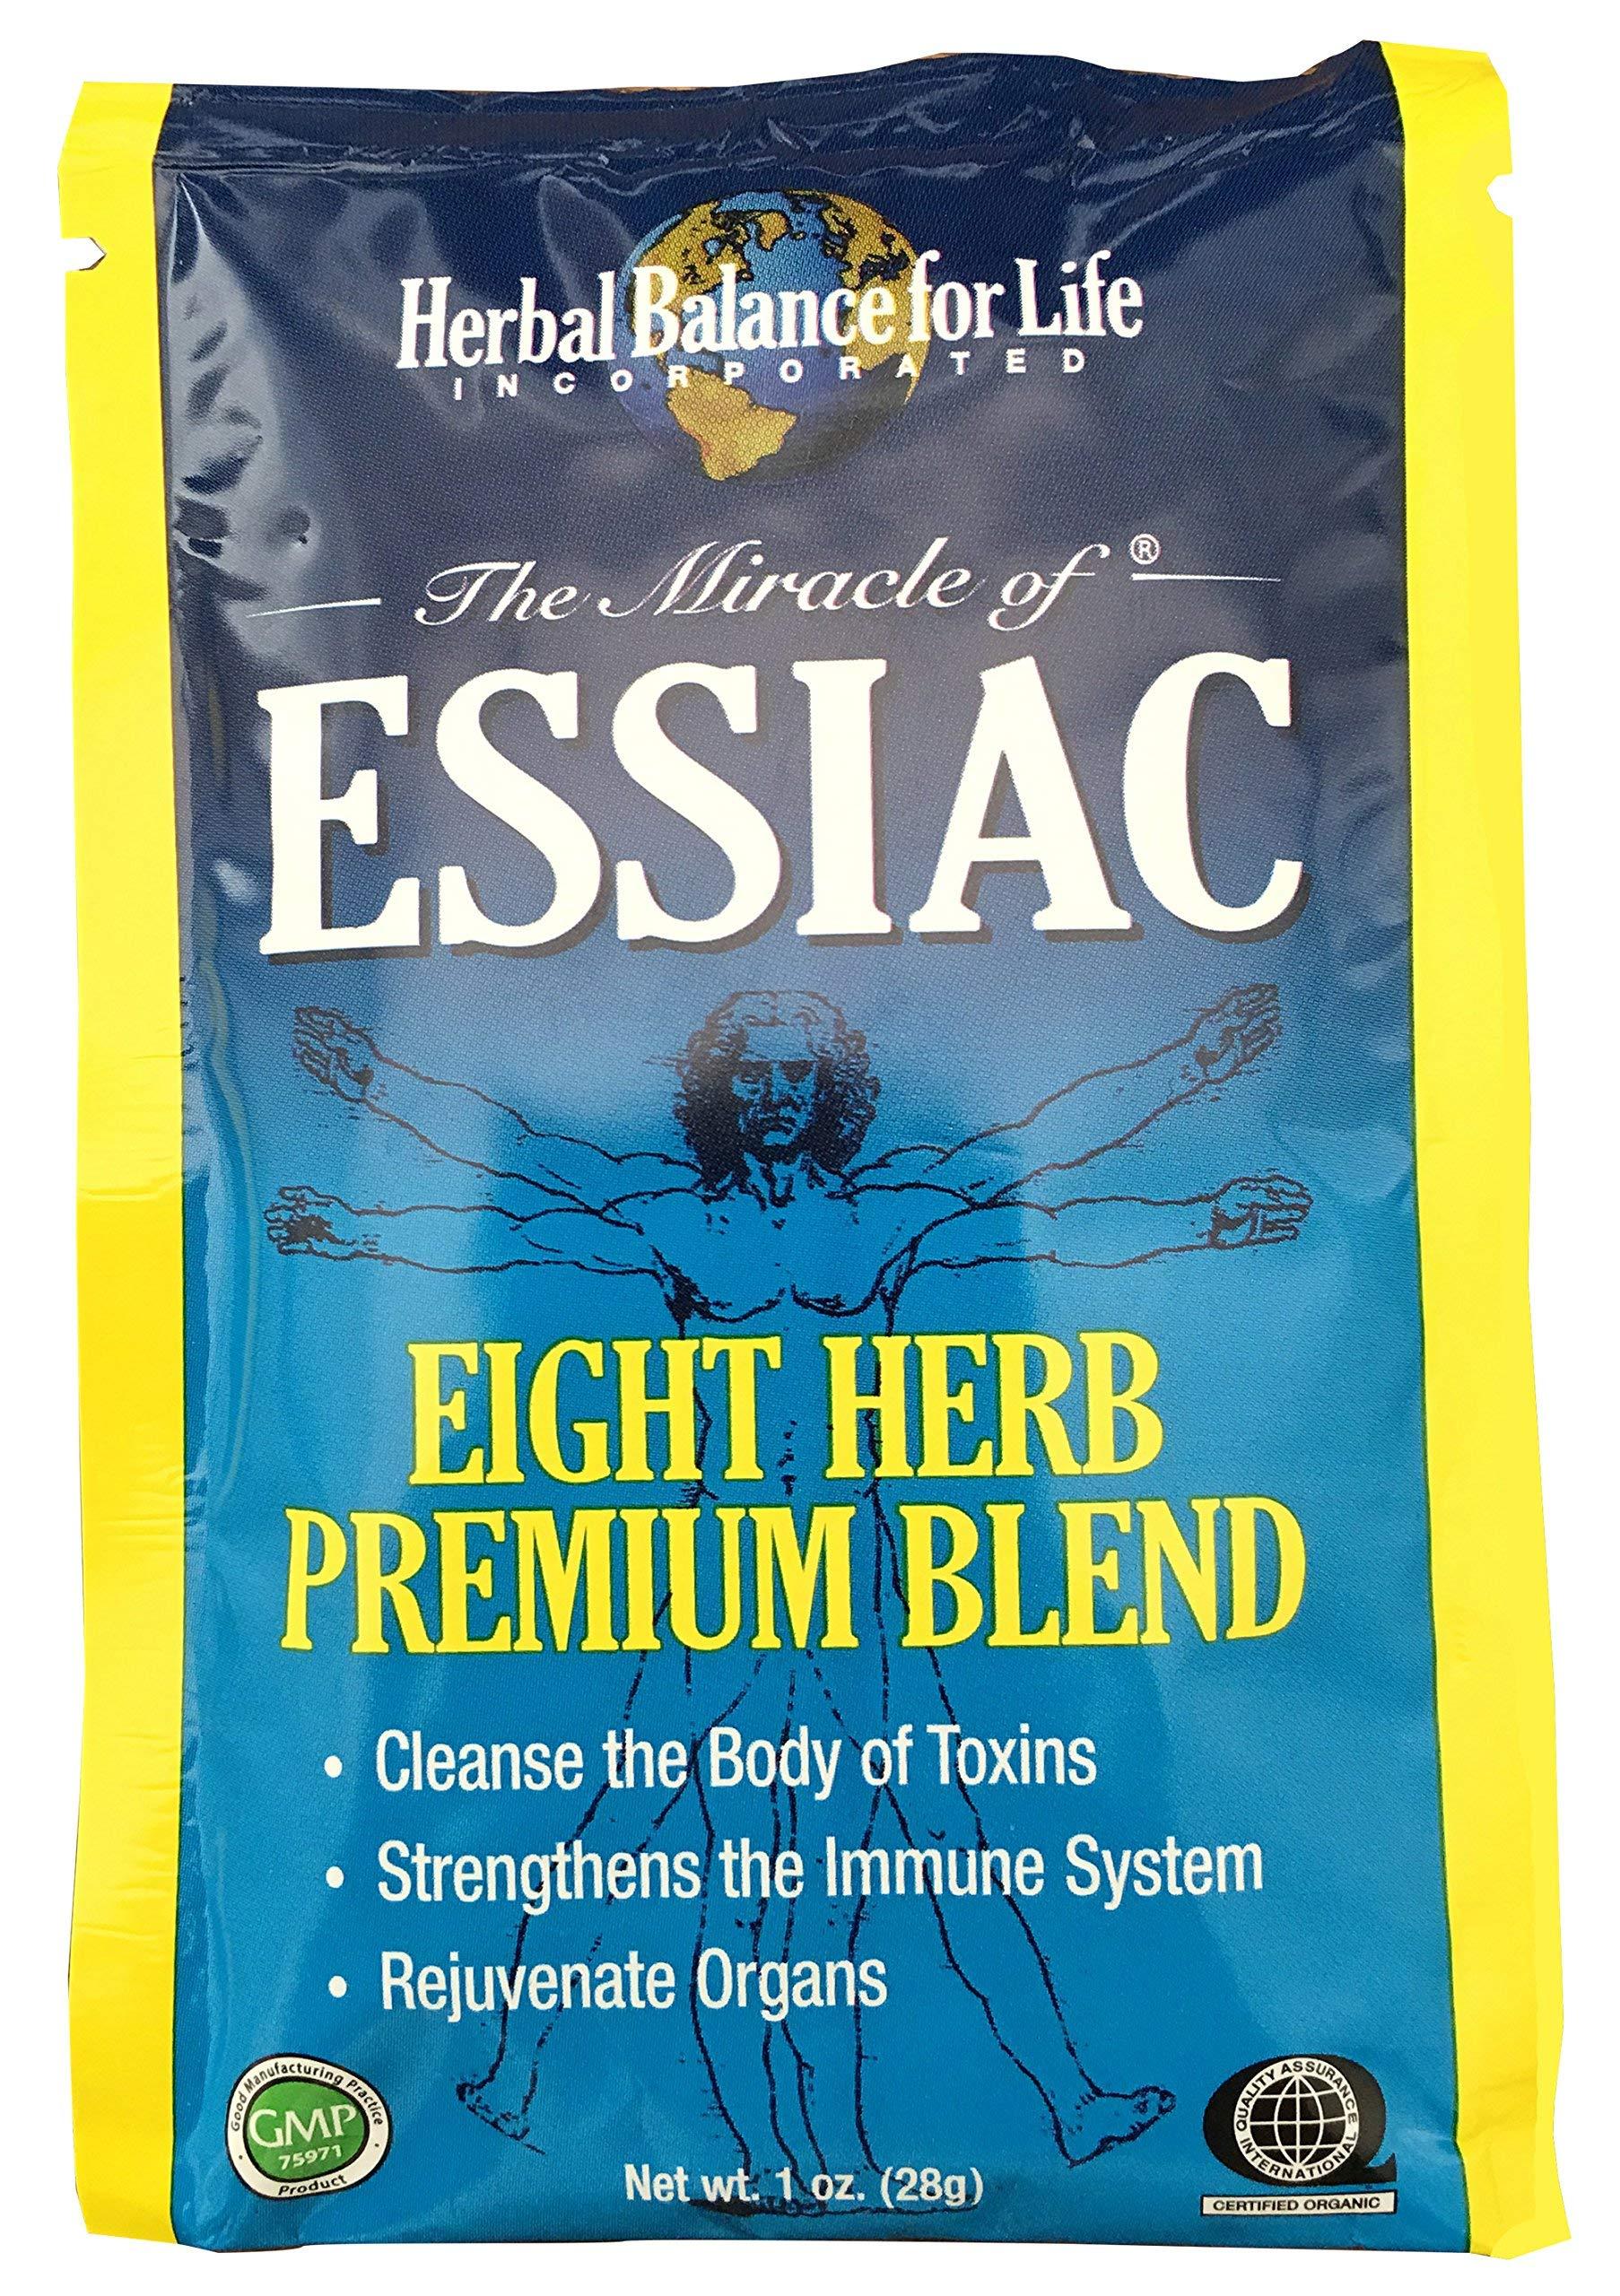 Essiac Tea, Eight Herb Upgraded Formula, Certified Organic Essiac, Certified by QAI, San Diego, 16-1 Oz. Packets Makes 16-1 Quart Bottles (4 Gal.) Essiac Tea!, 128 Day Supply